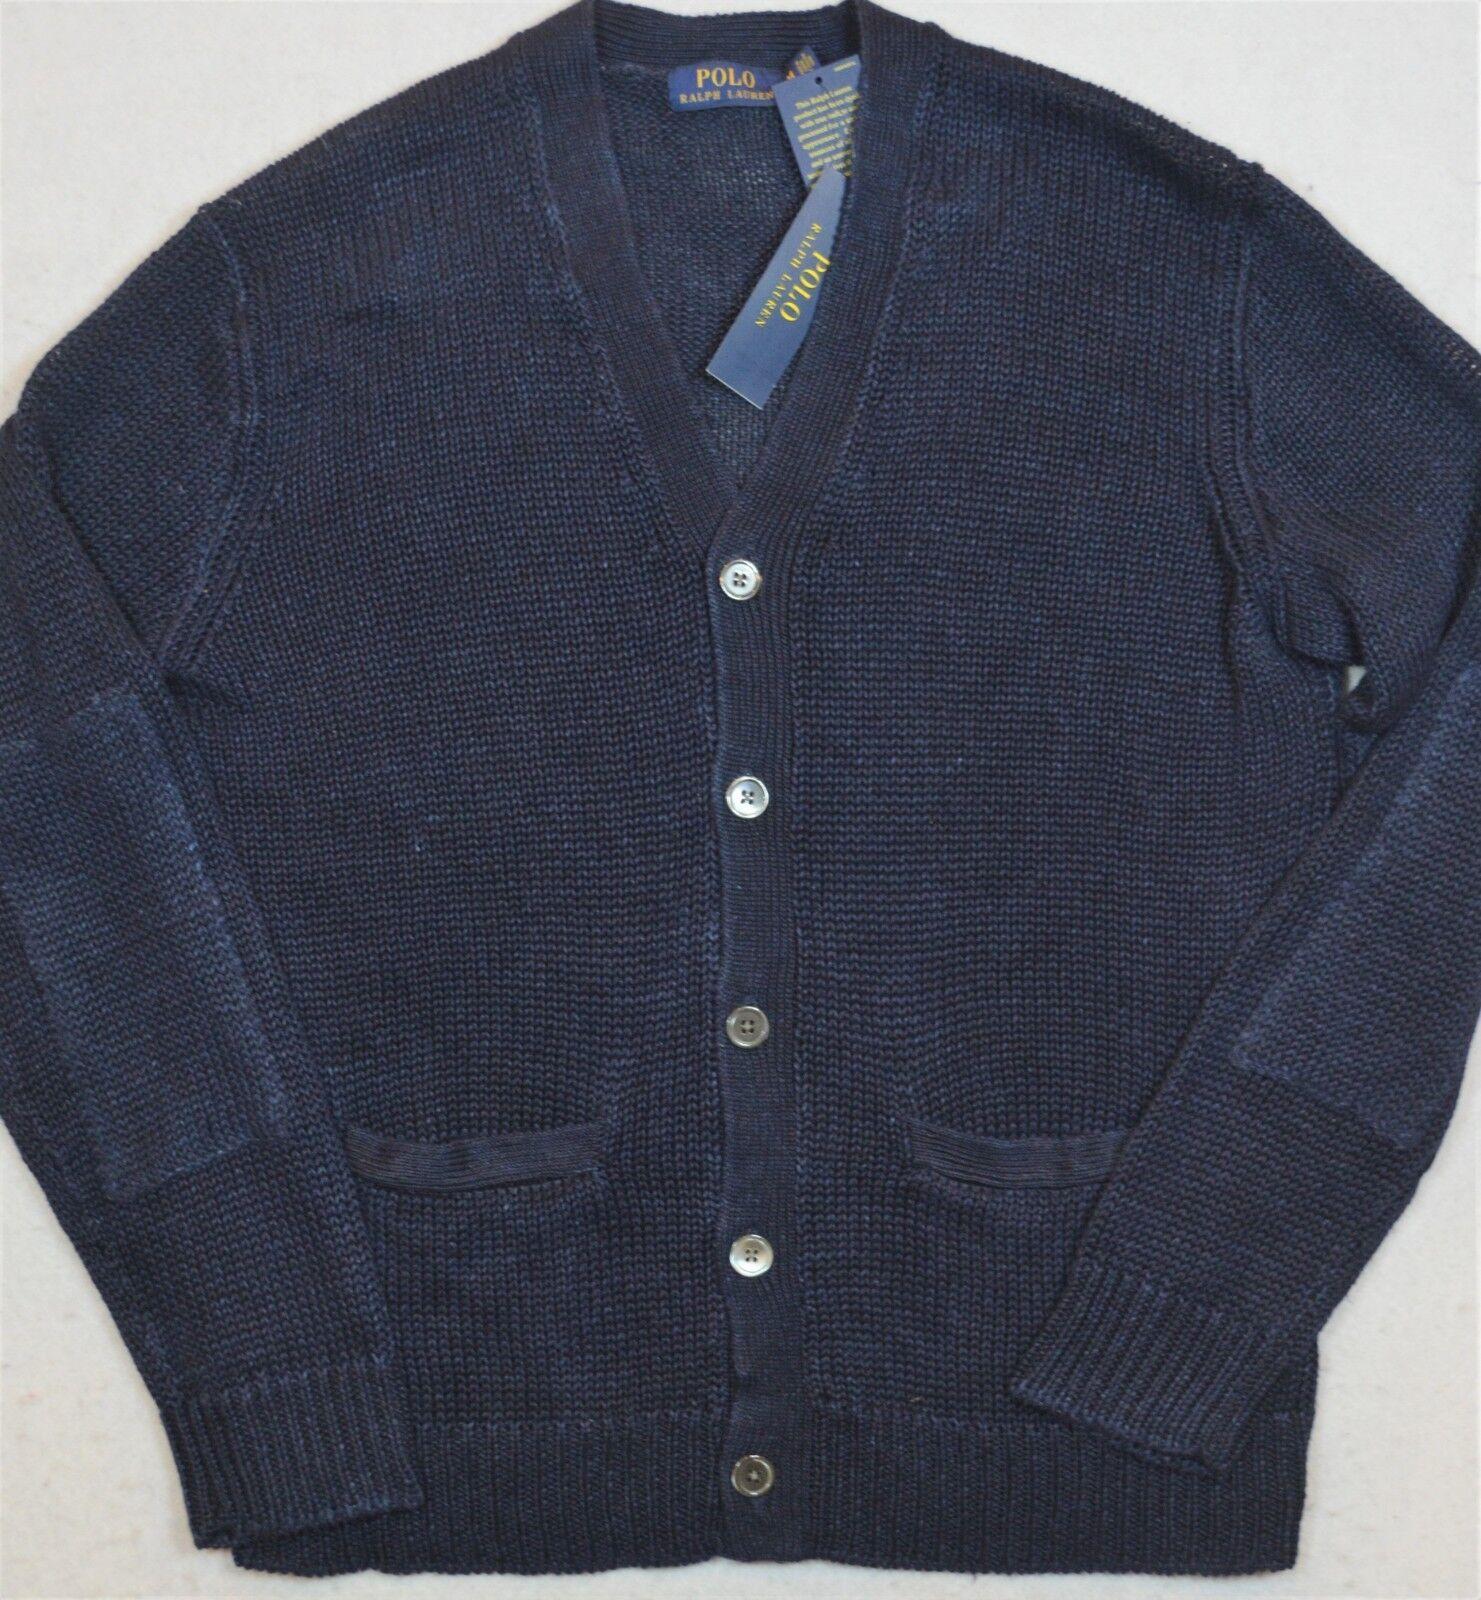 Polo Ralph Lauren Cardigan Sweater Indigo Dyed Linen Größe XL NWT  265